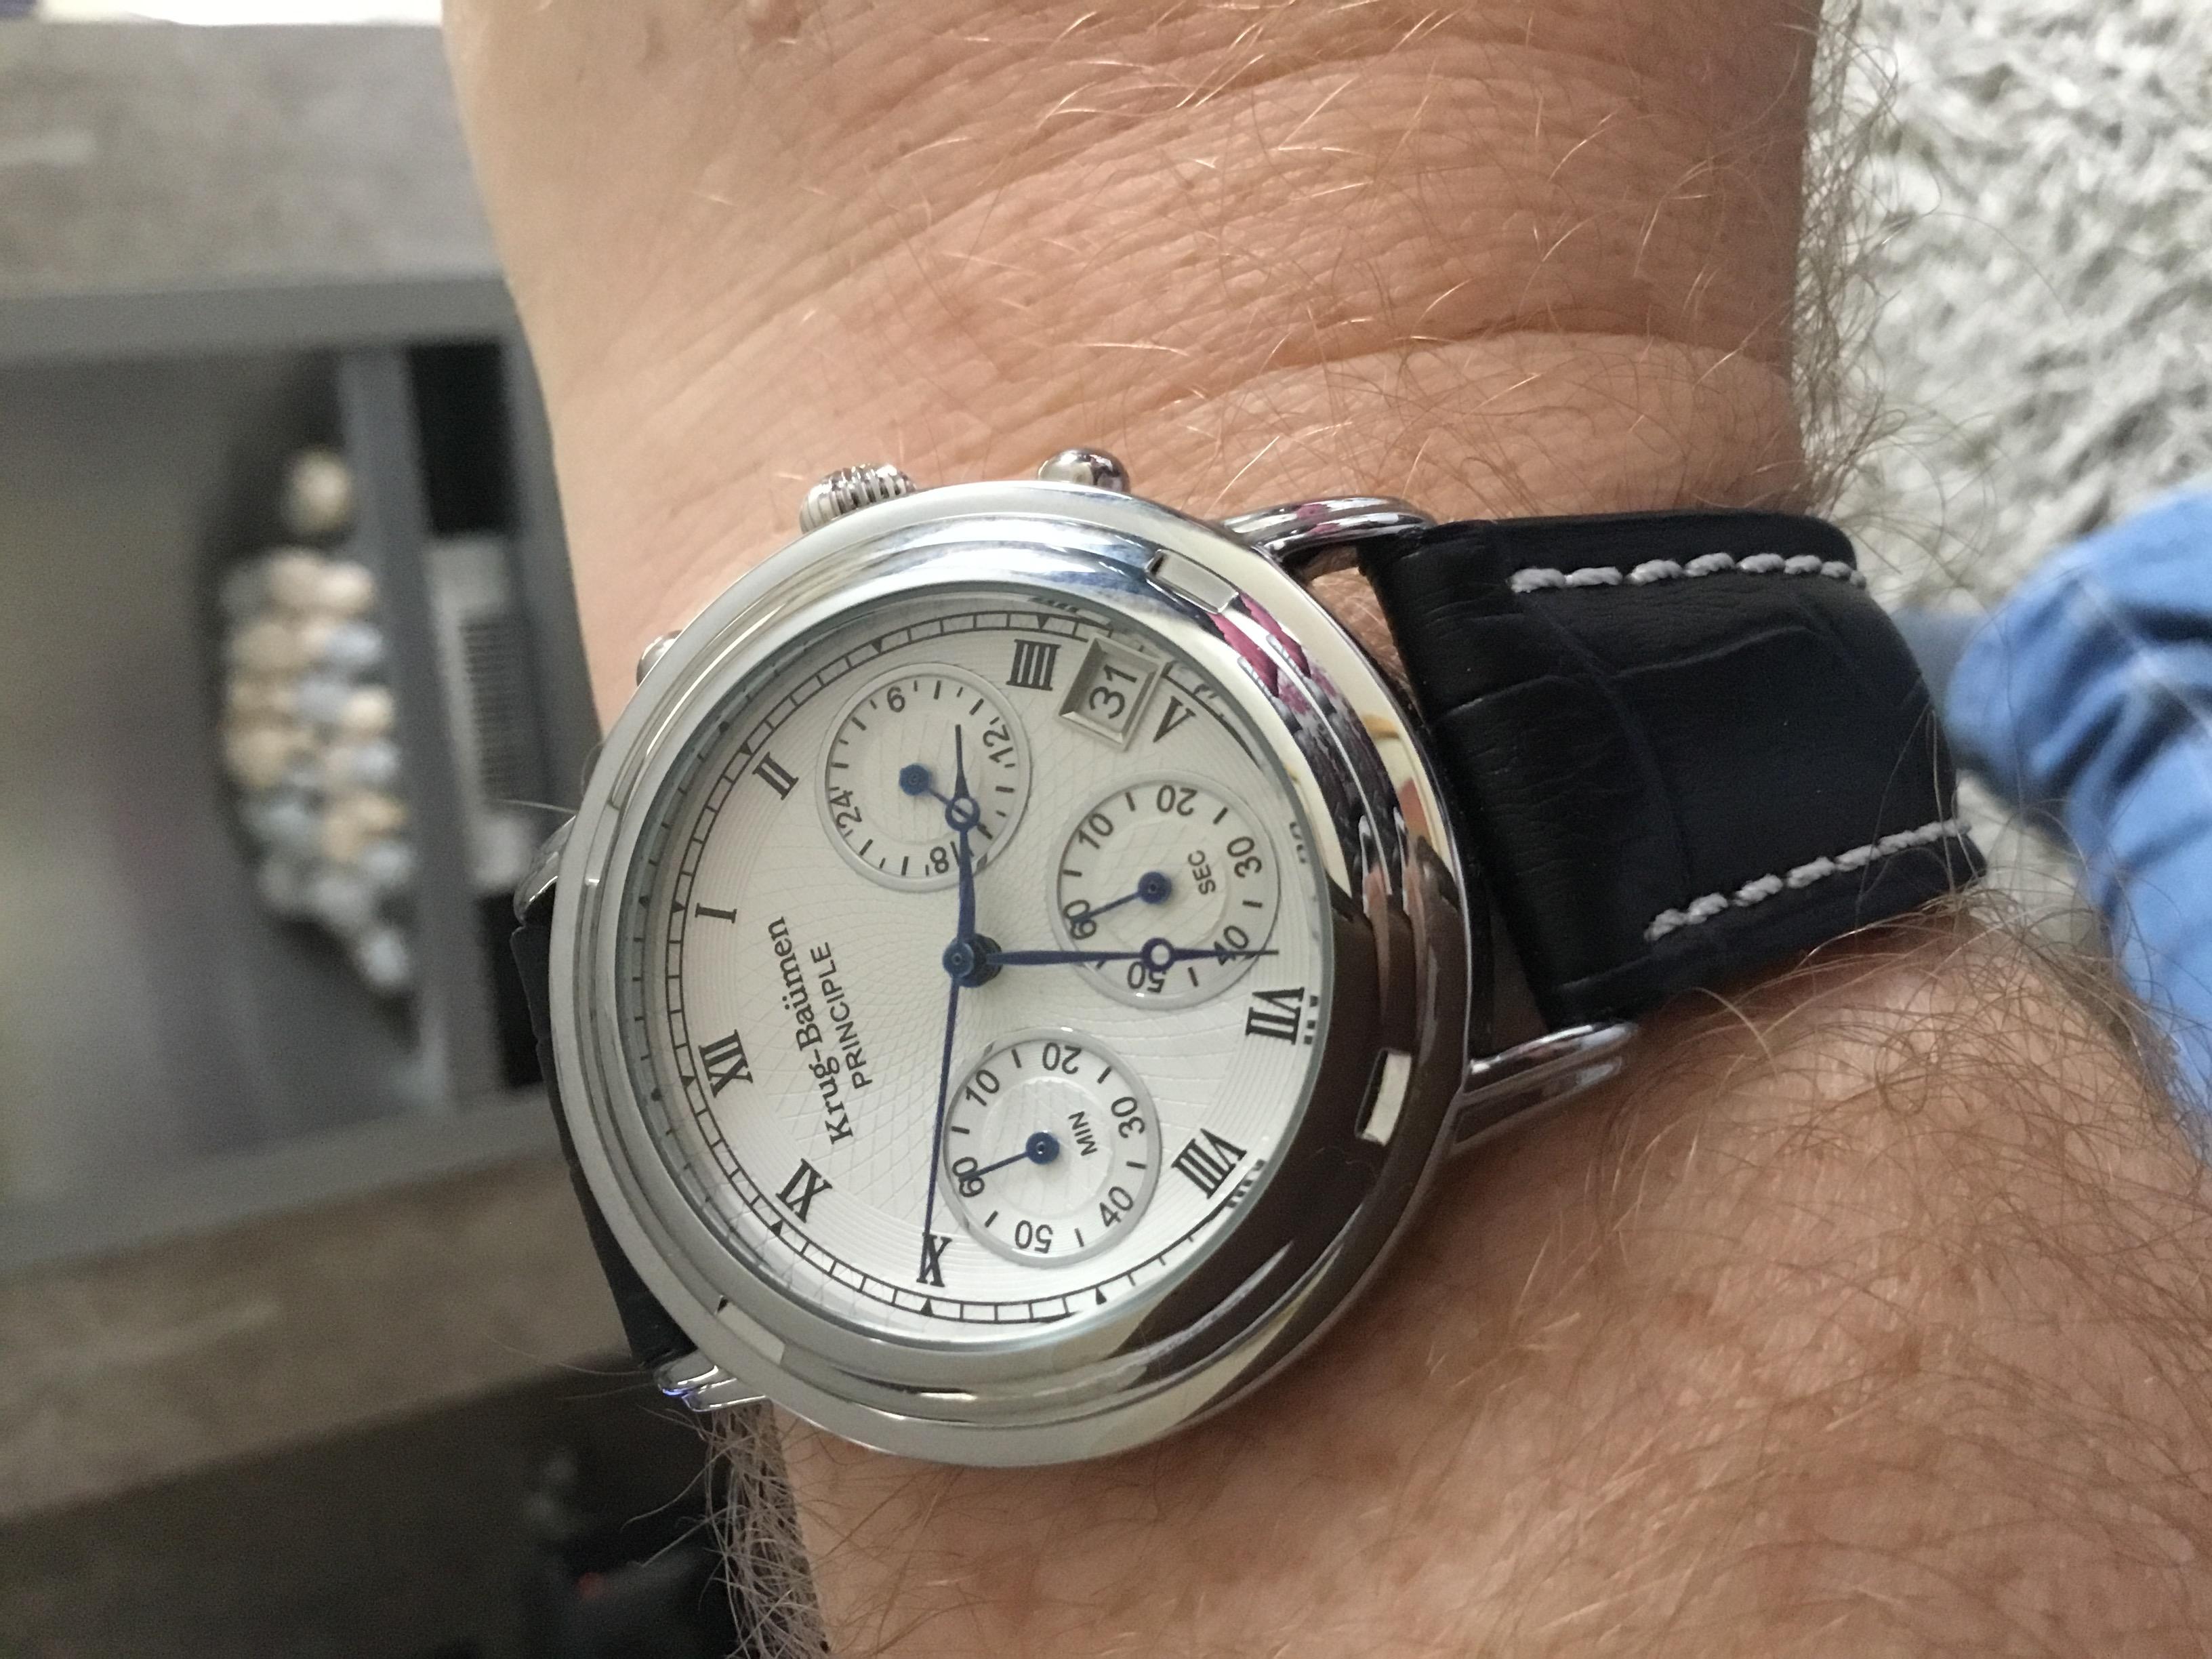 Armband- & Taschenuhren Krug-baumen 2011km Krug-baumen Principle Classic Mens Chronograph Watch Model